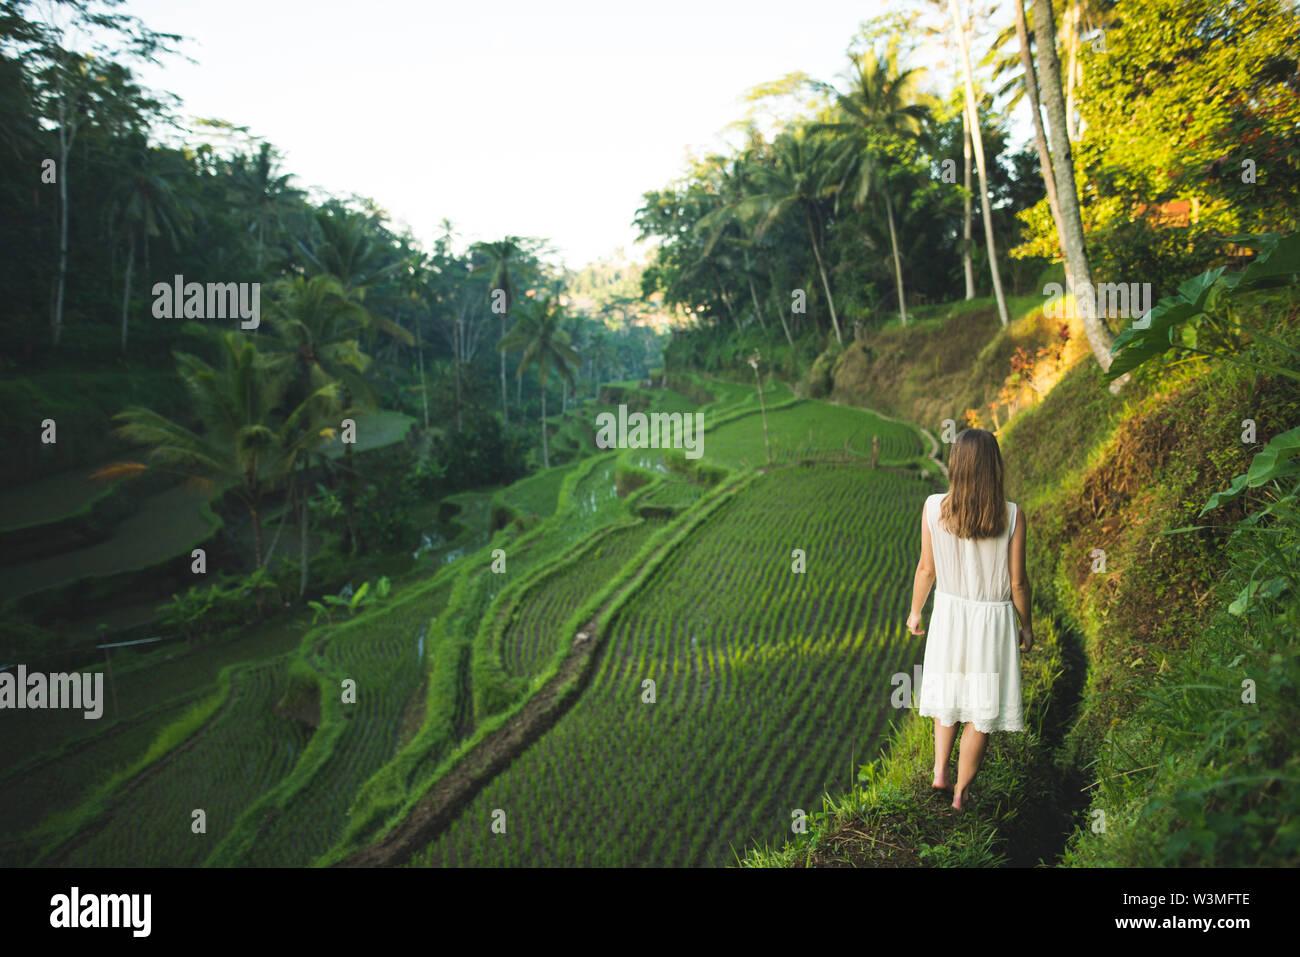 Woman wearing white dress on terraced rice paddies in Bali, Indonesia - Stock Image